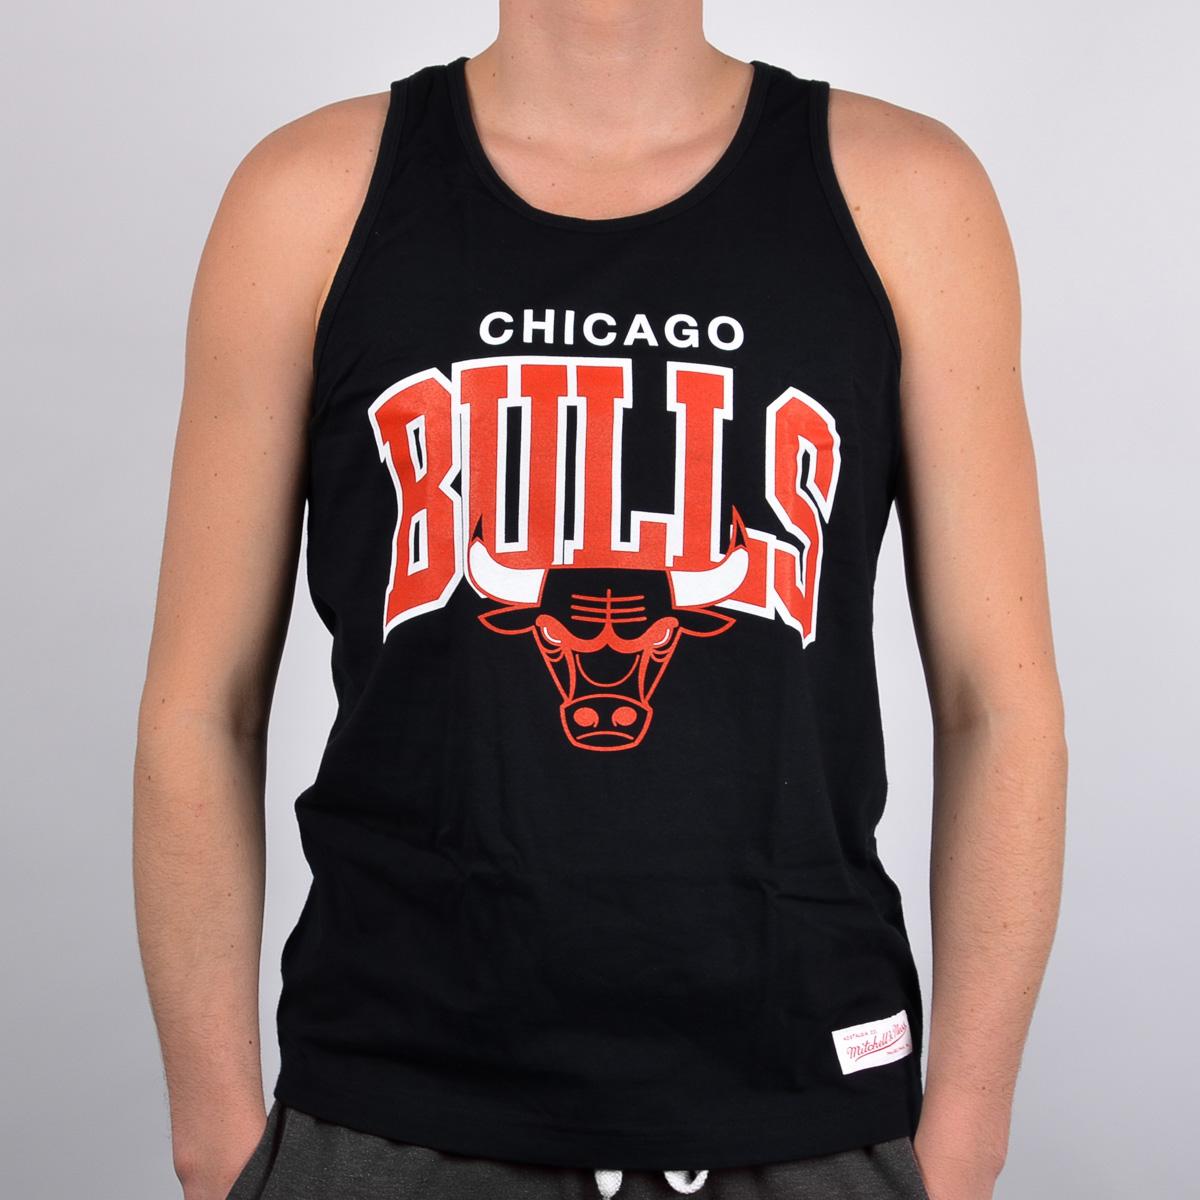 aea3e1570c4 Mitchell   Ness Chicago Bulls Team Arch Tank Top - NBA Shop Chicago Bulls  Merchandise - Superfanas.lt